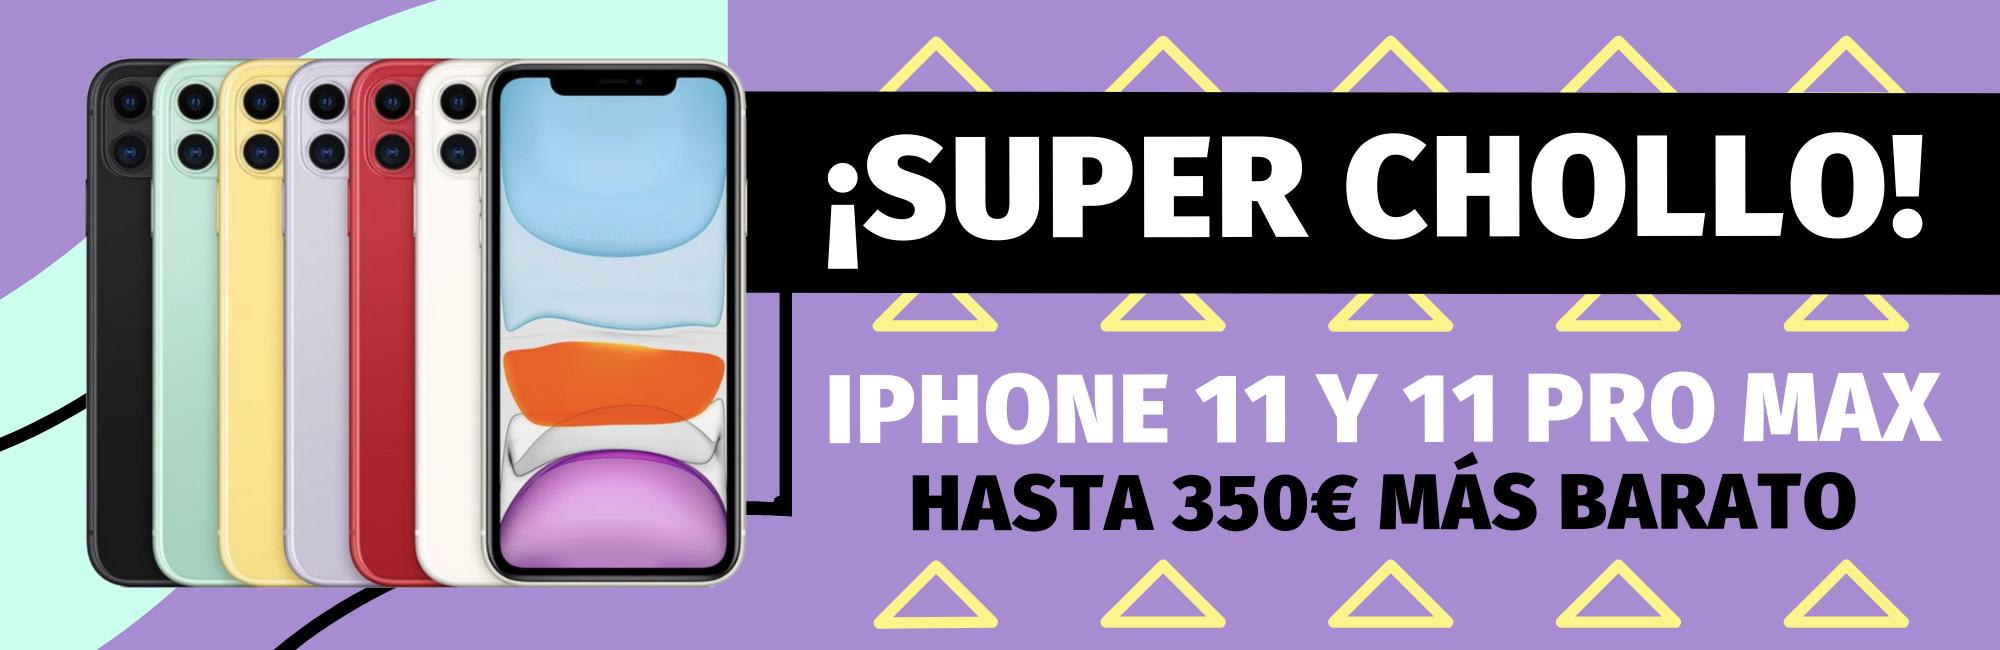 OFERTAS IPHONE 11 PRO Y PROMAX